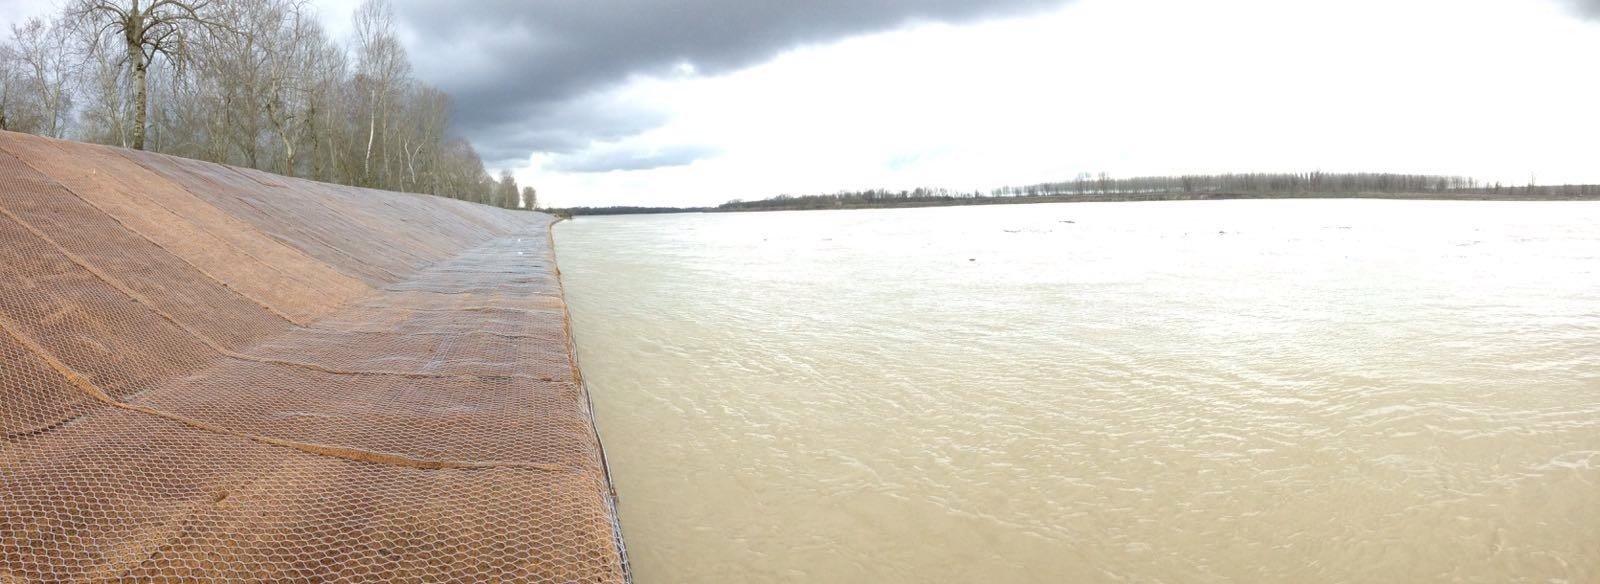 difesa spondale sul fiume